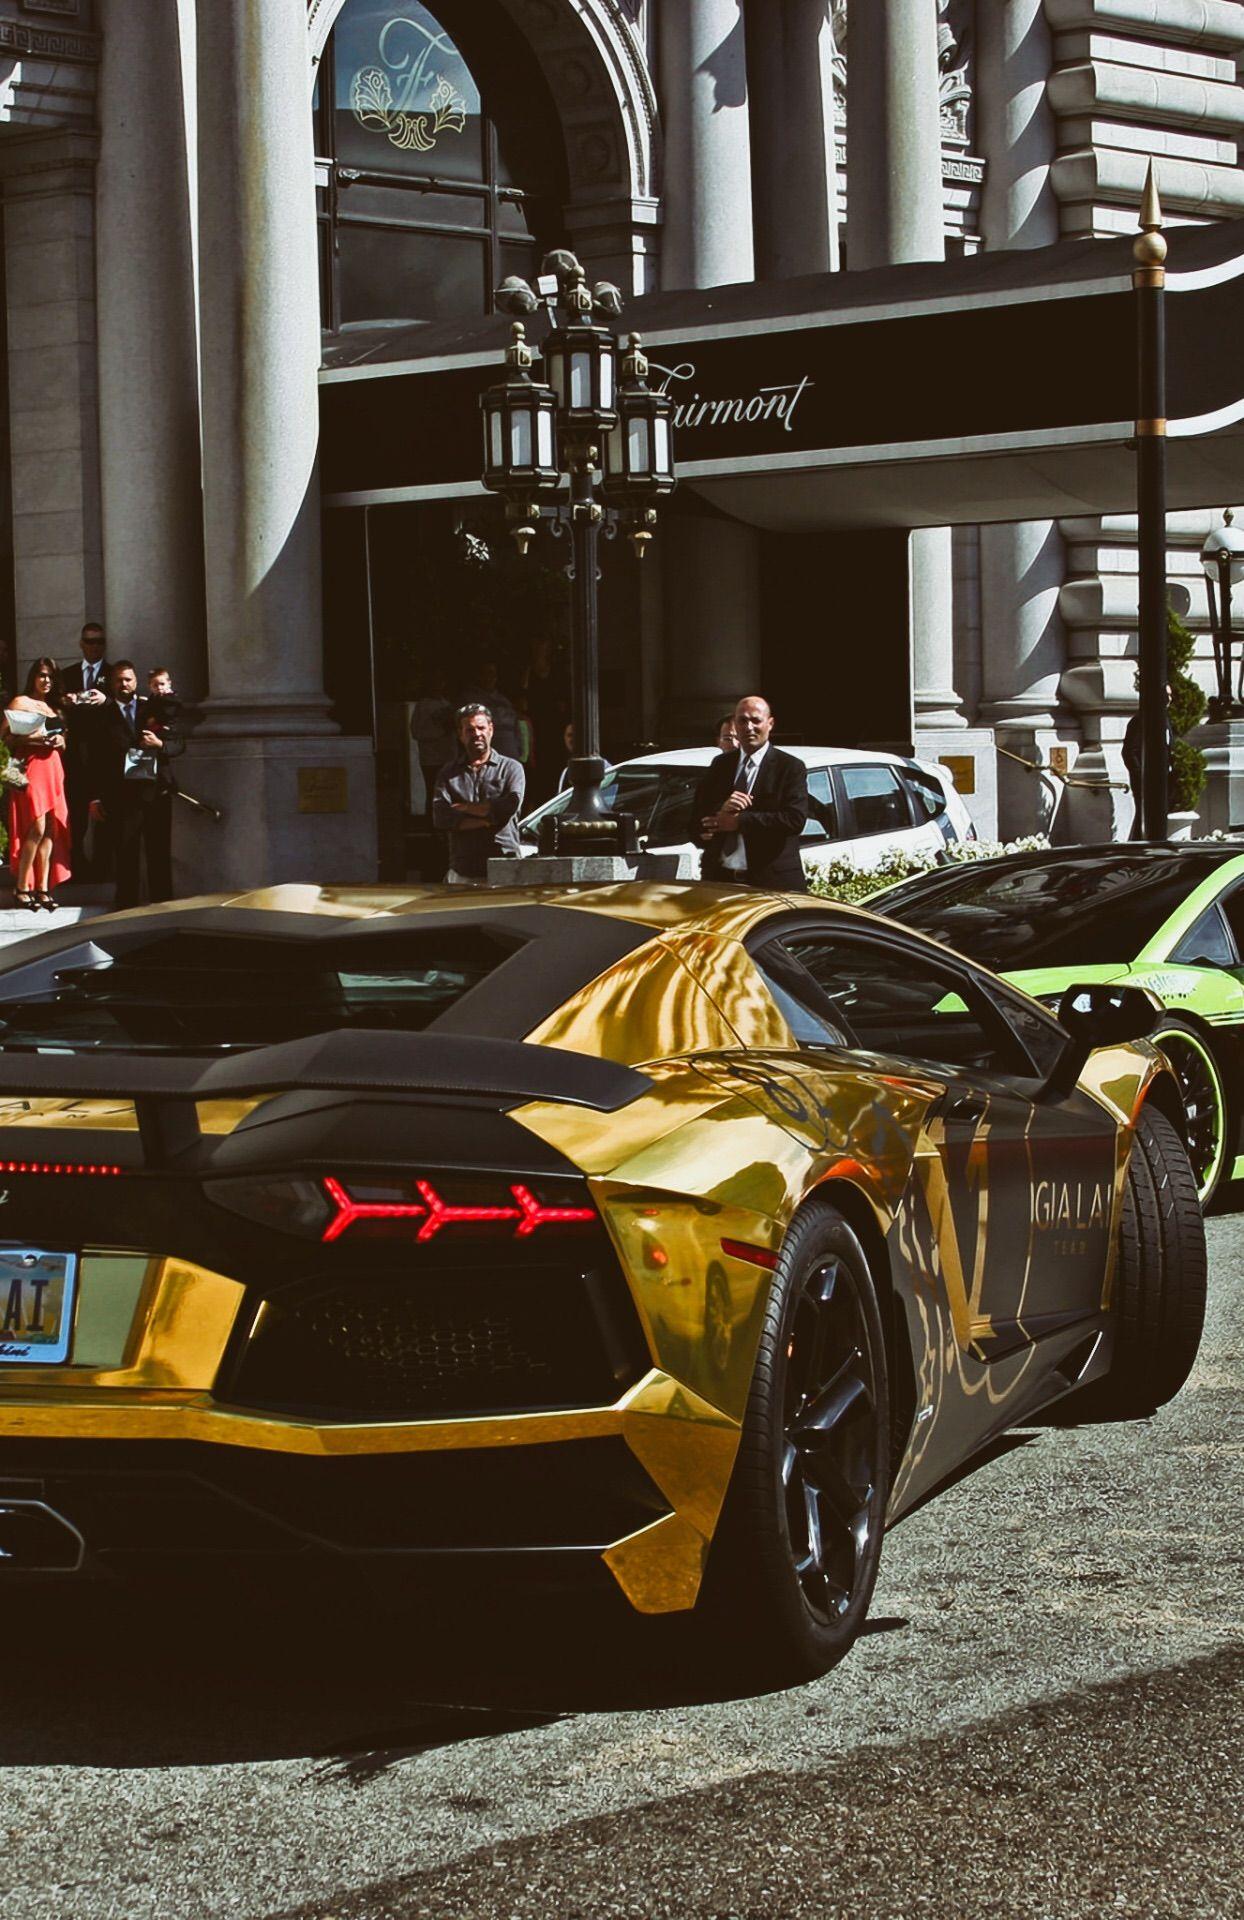 Gold Aventador Auto de lujo, Coches de lujo, Autos